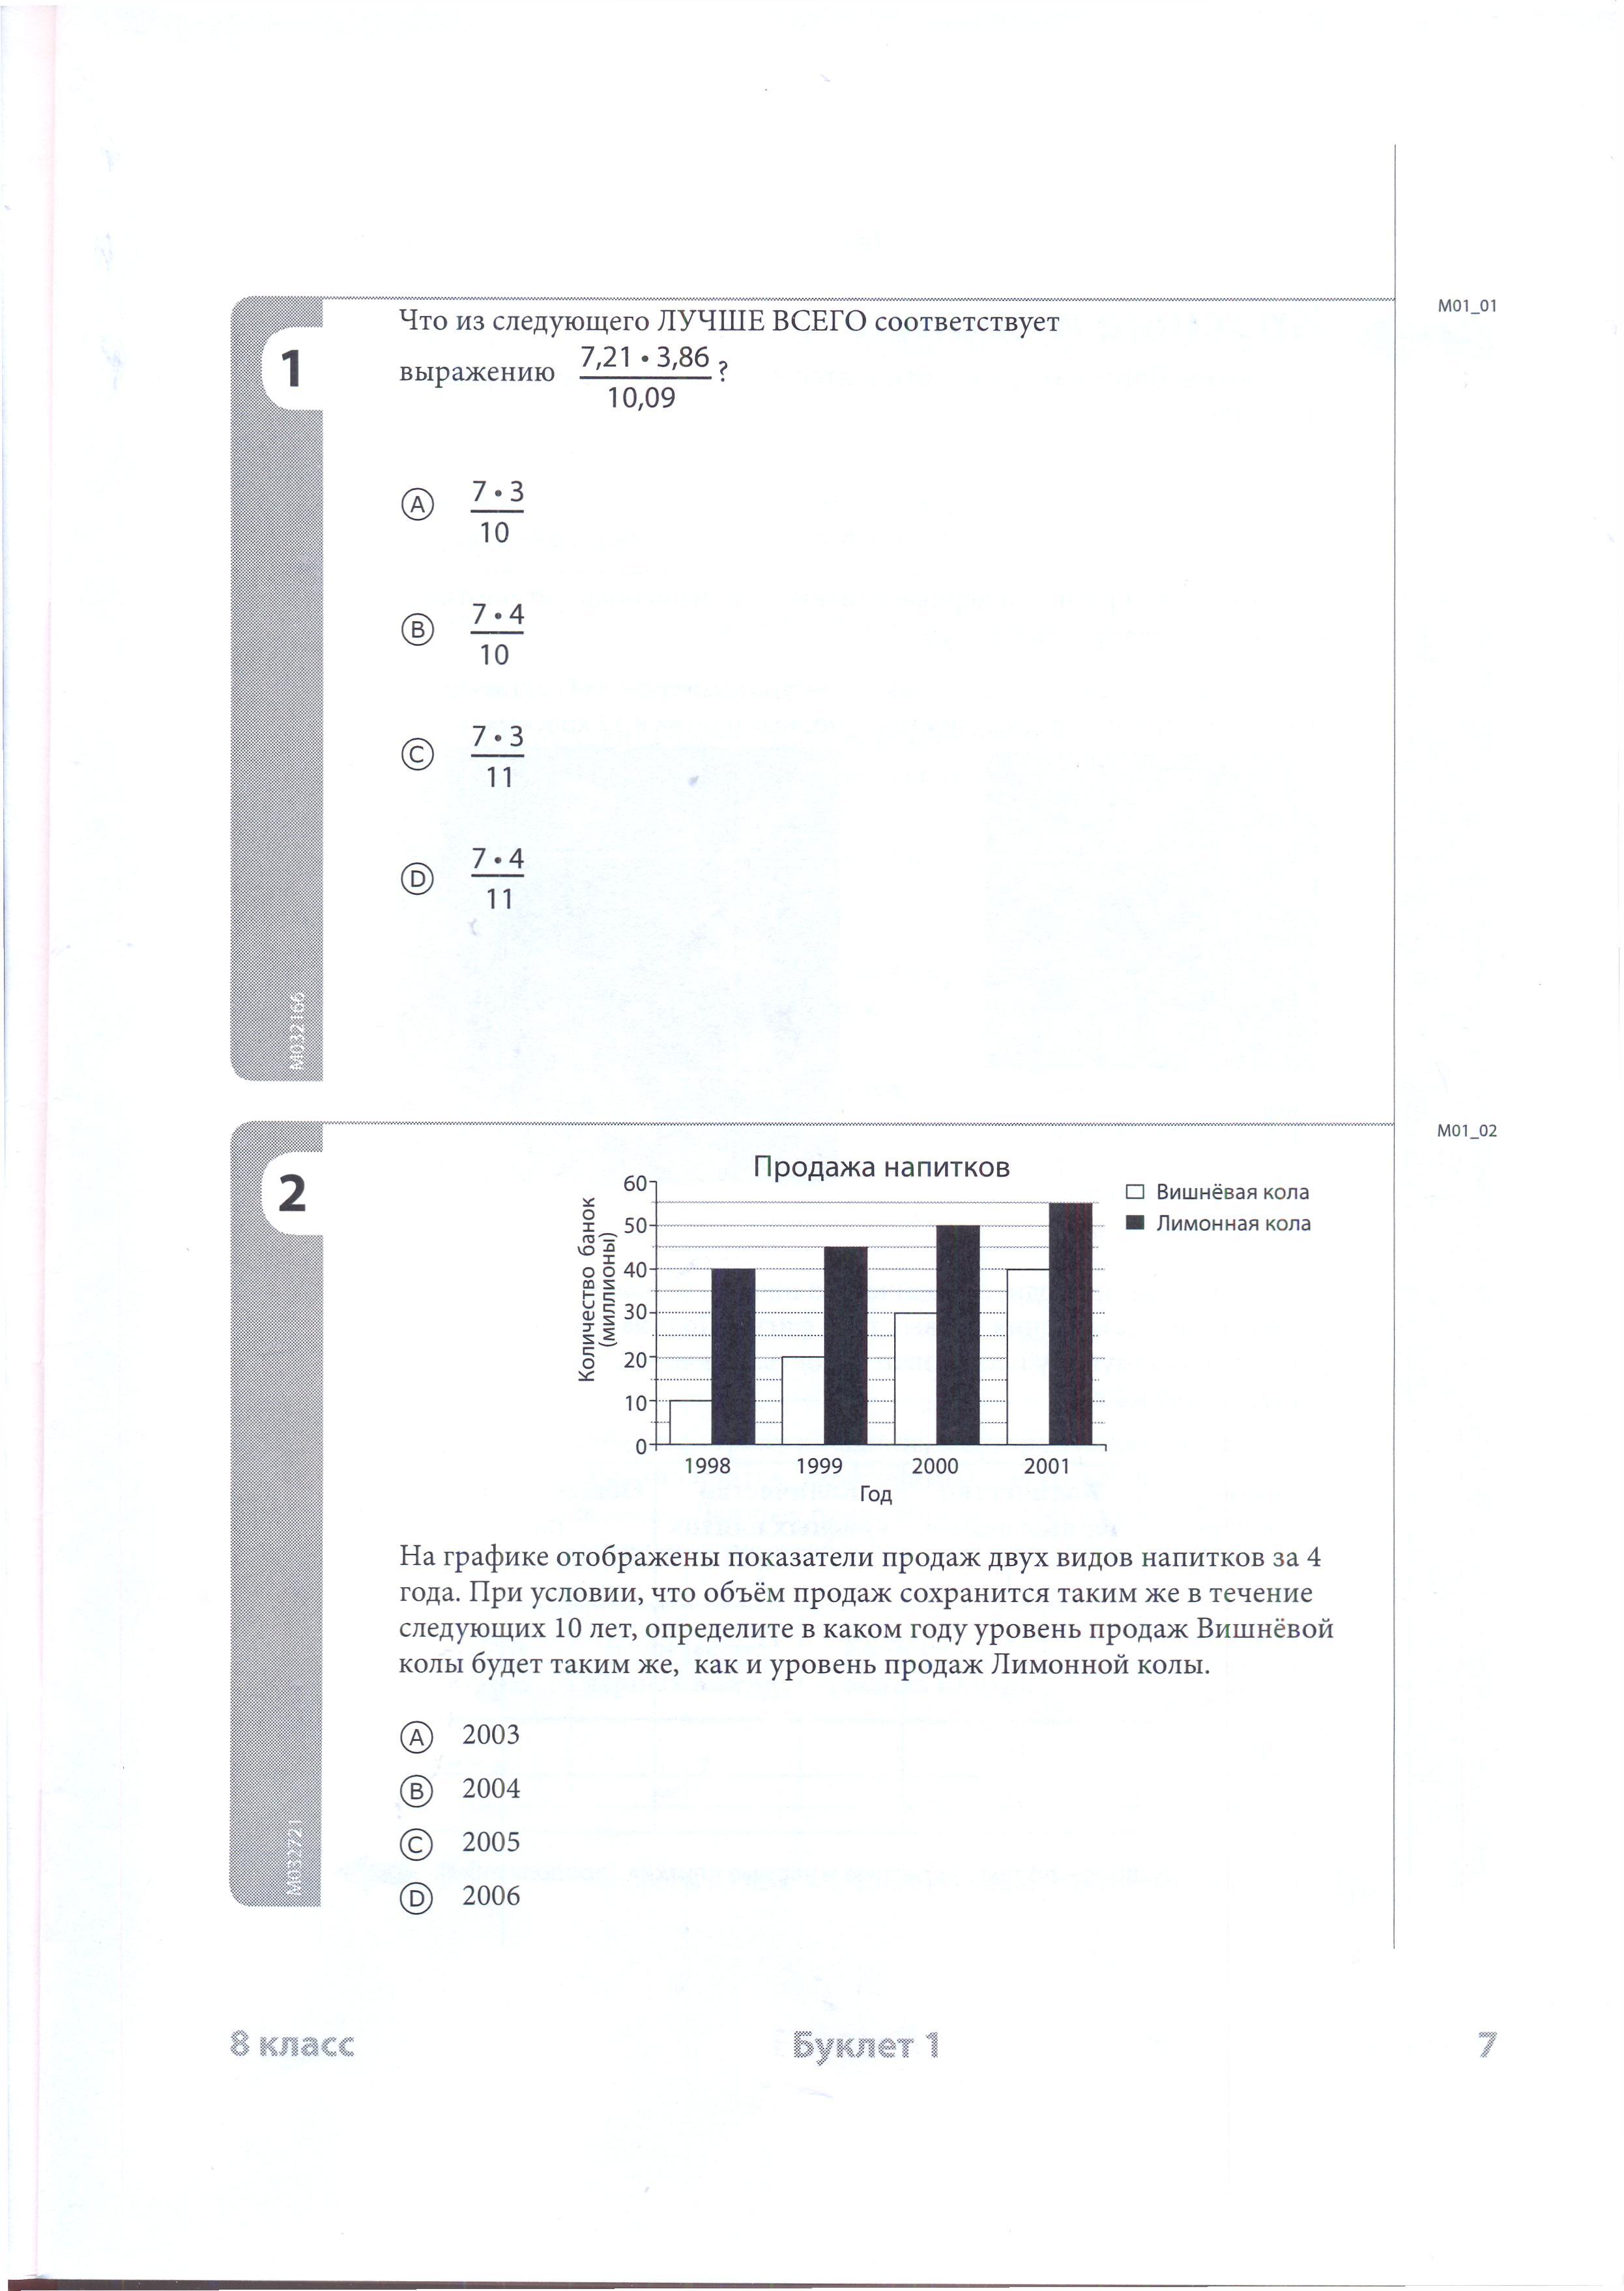 H:\Доклад ТИМСС Алматы 8.04.2014\TIMSS MATEM 8 kl_1 var\Matematic 8 kl_1 var0003.jpg